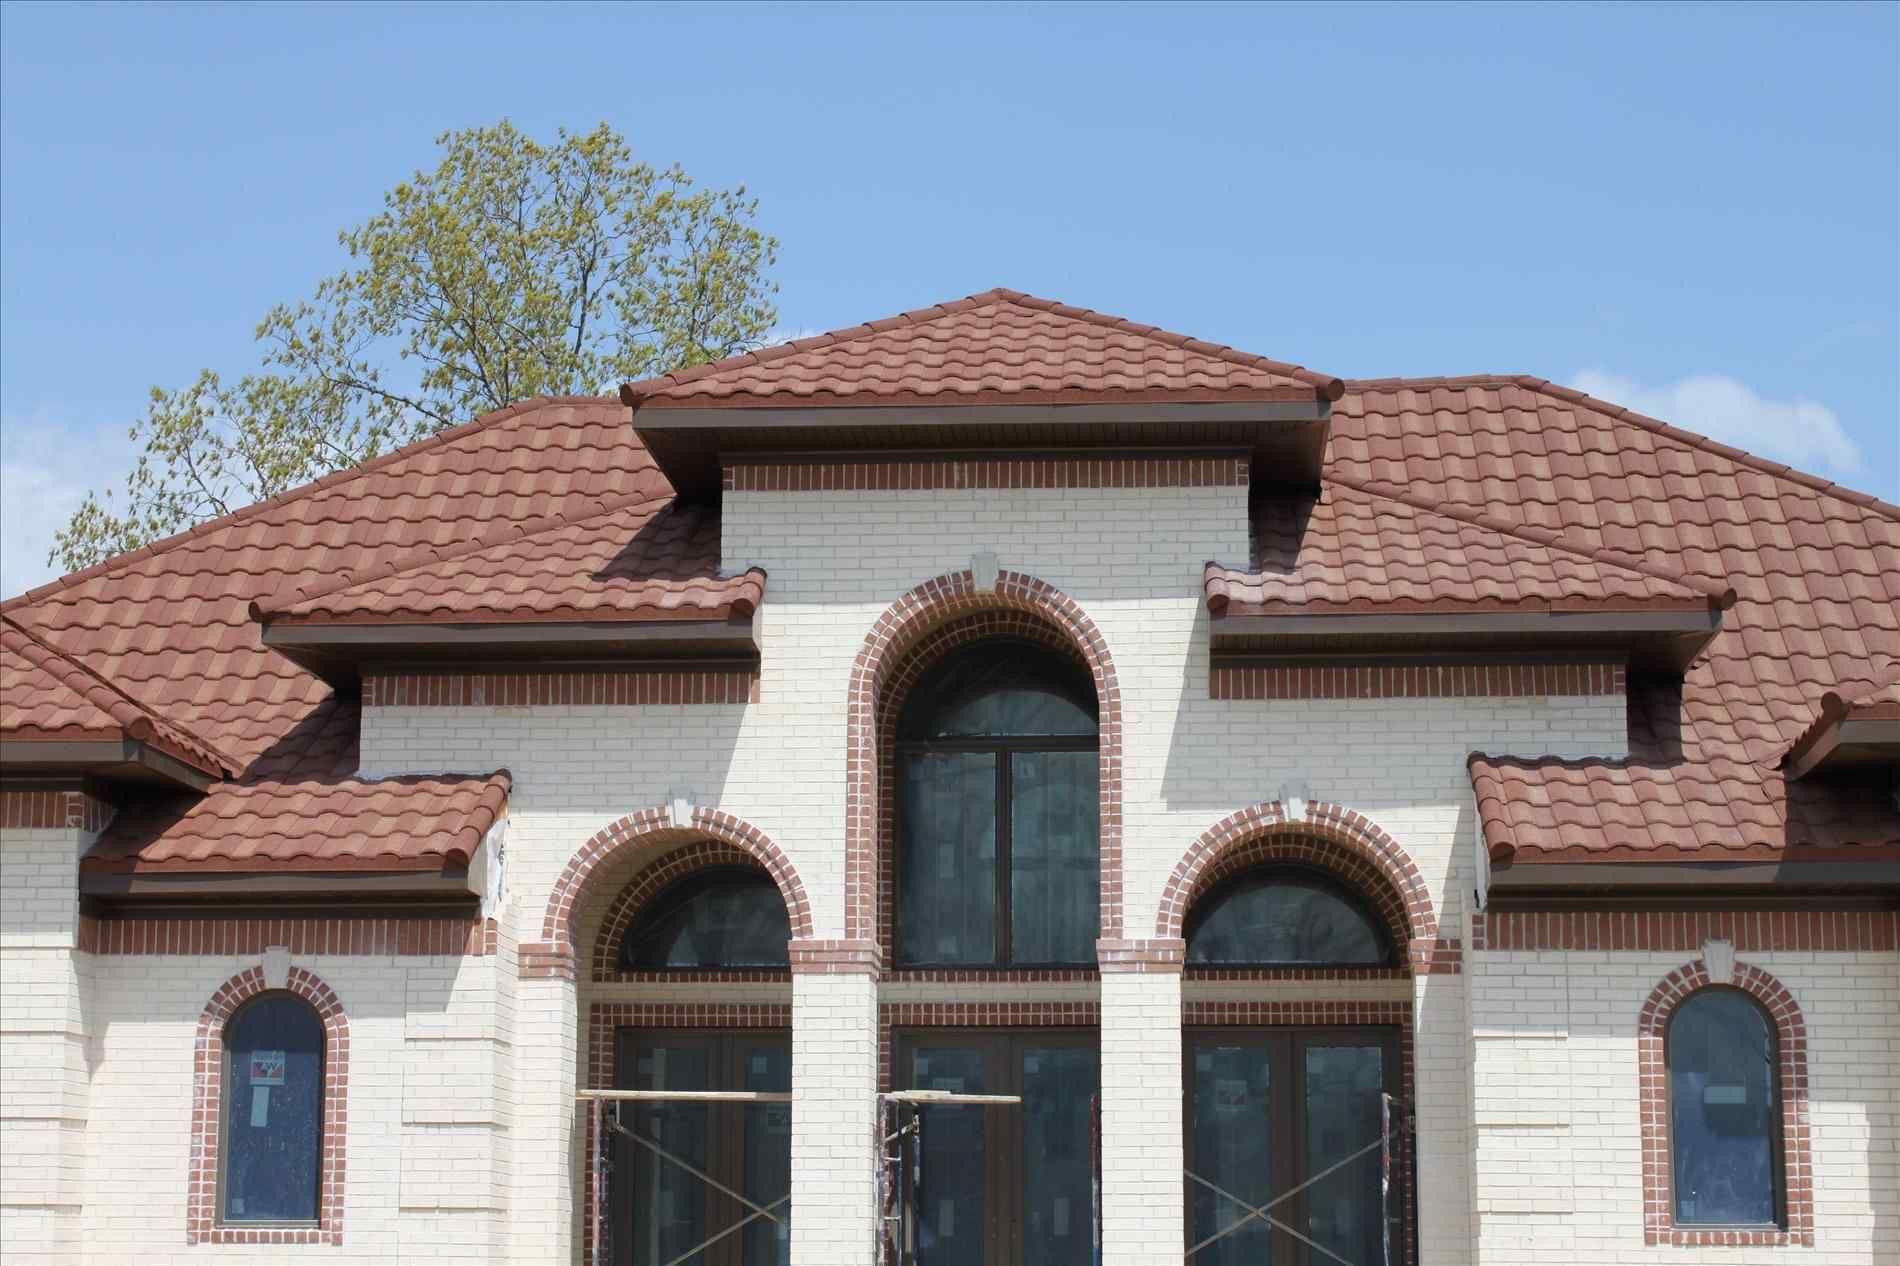 Metal Roofing Portland Oregon Home Roof Ideas Roof Framing Roofing Metal Roofing Prices